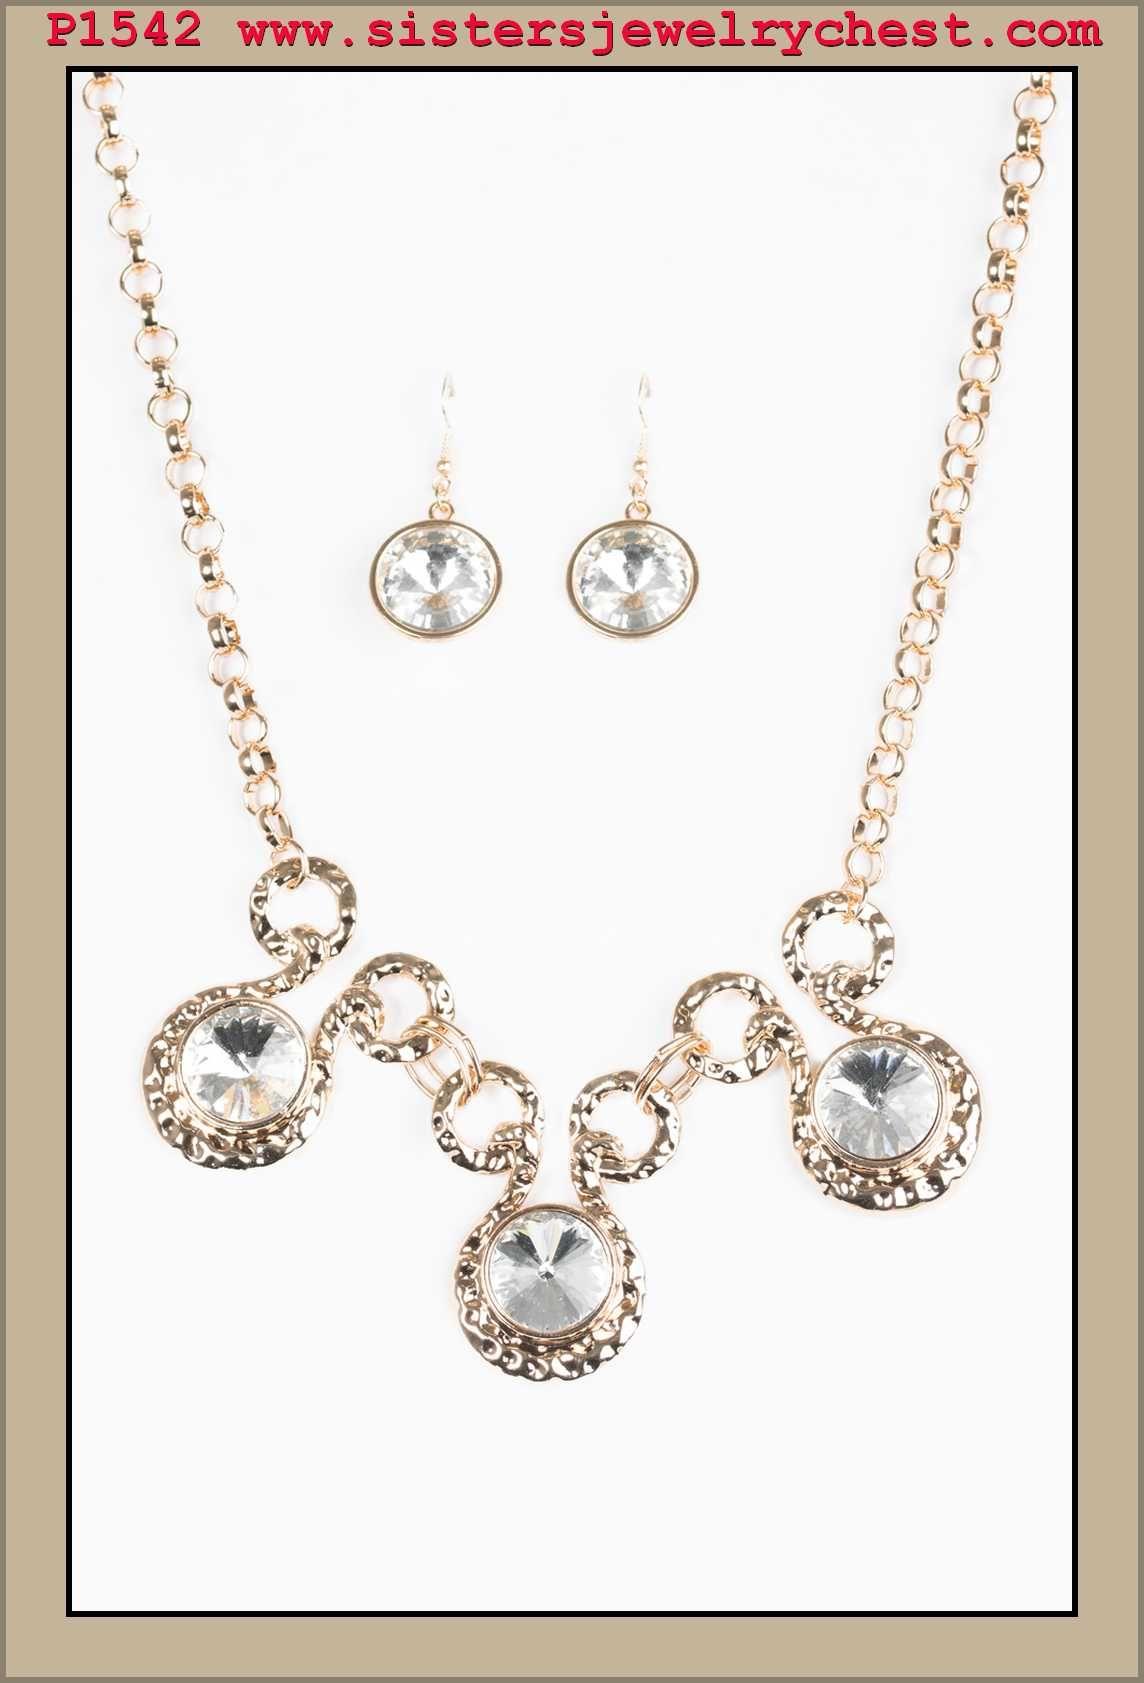 Hypnotized Gold Paparazzi Accessories Bridesmaid